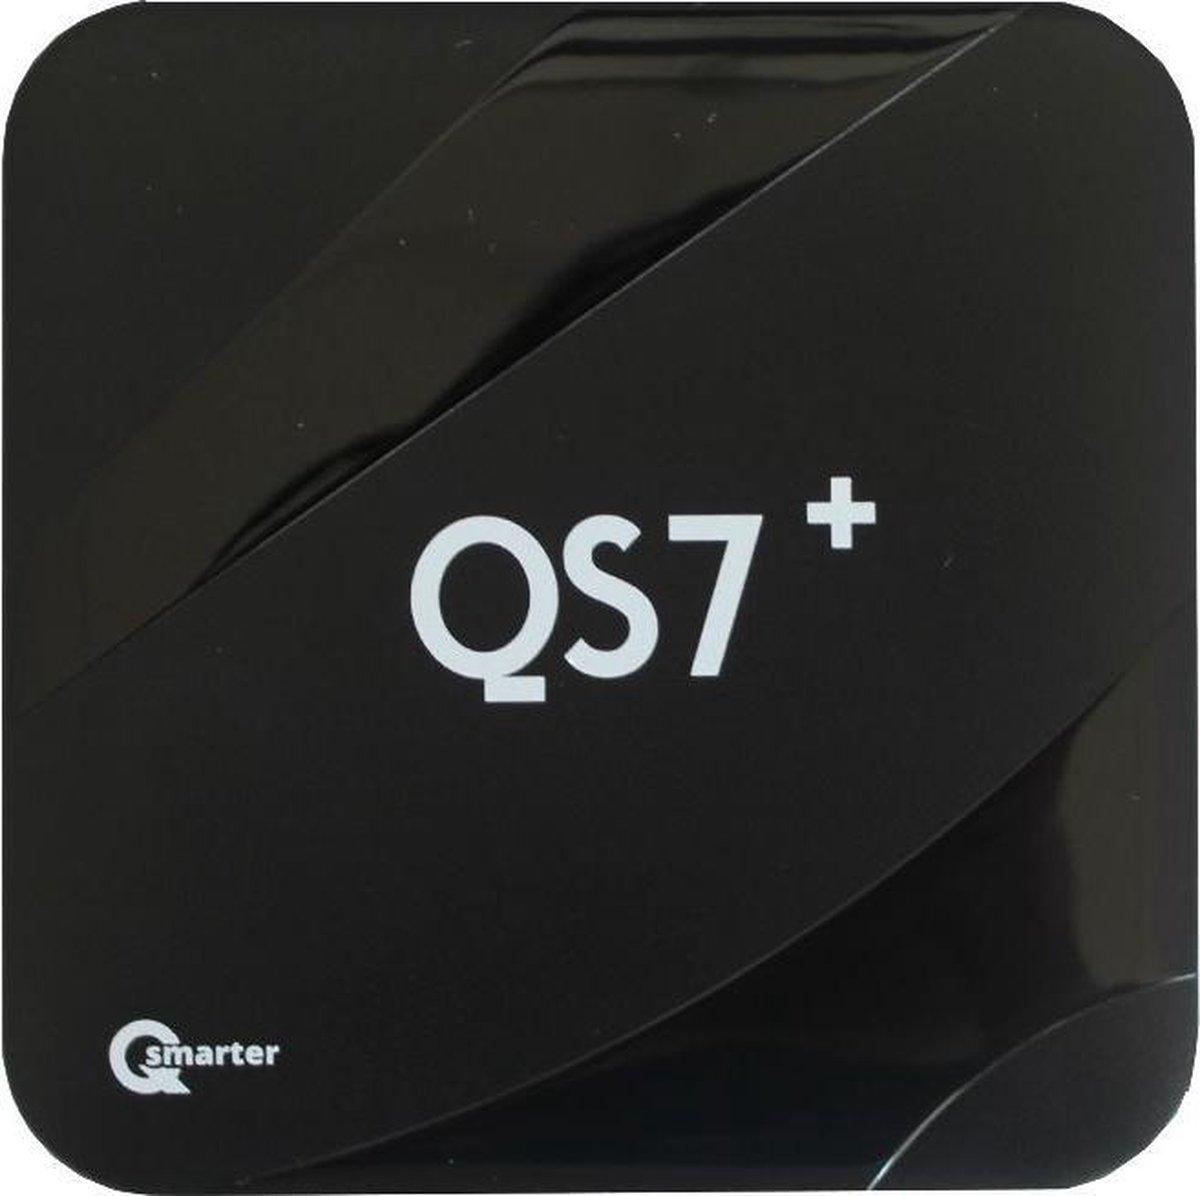 QSmarter QS7+ IPTV Box met Android   Dual-Band WiFi & 2GB Ram   My TV Box   4K 60 fps IPTV mediabox